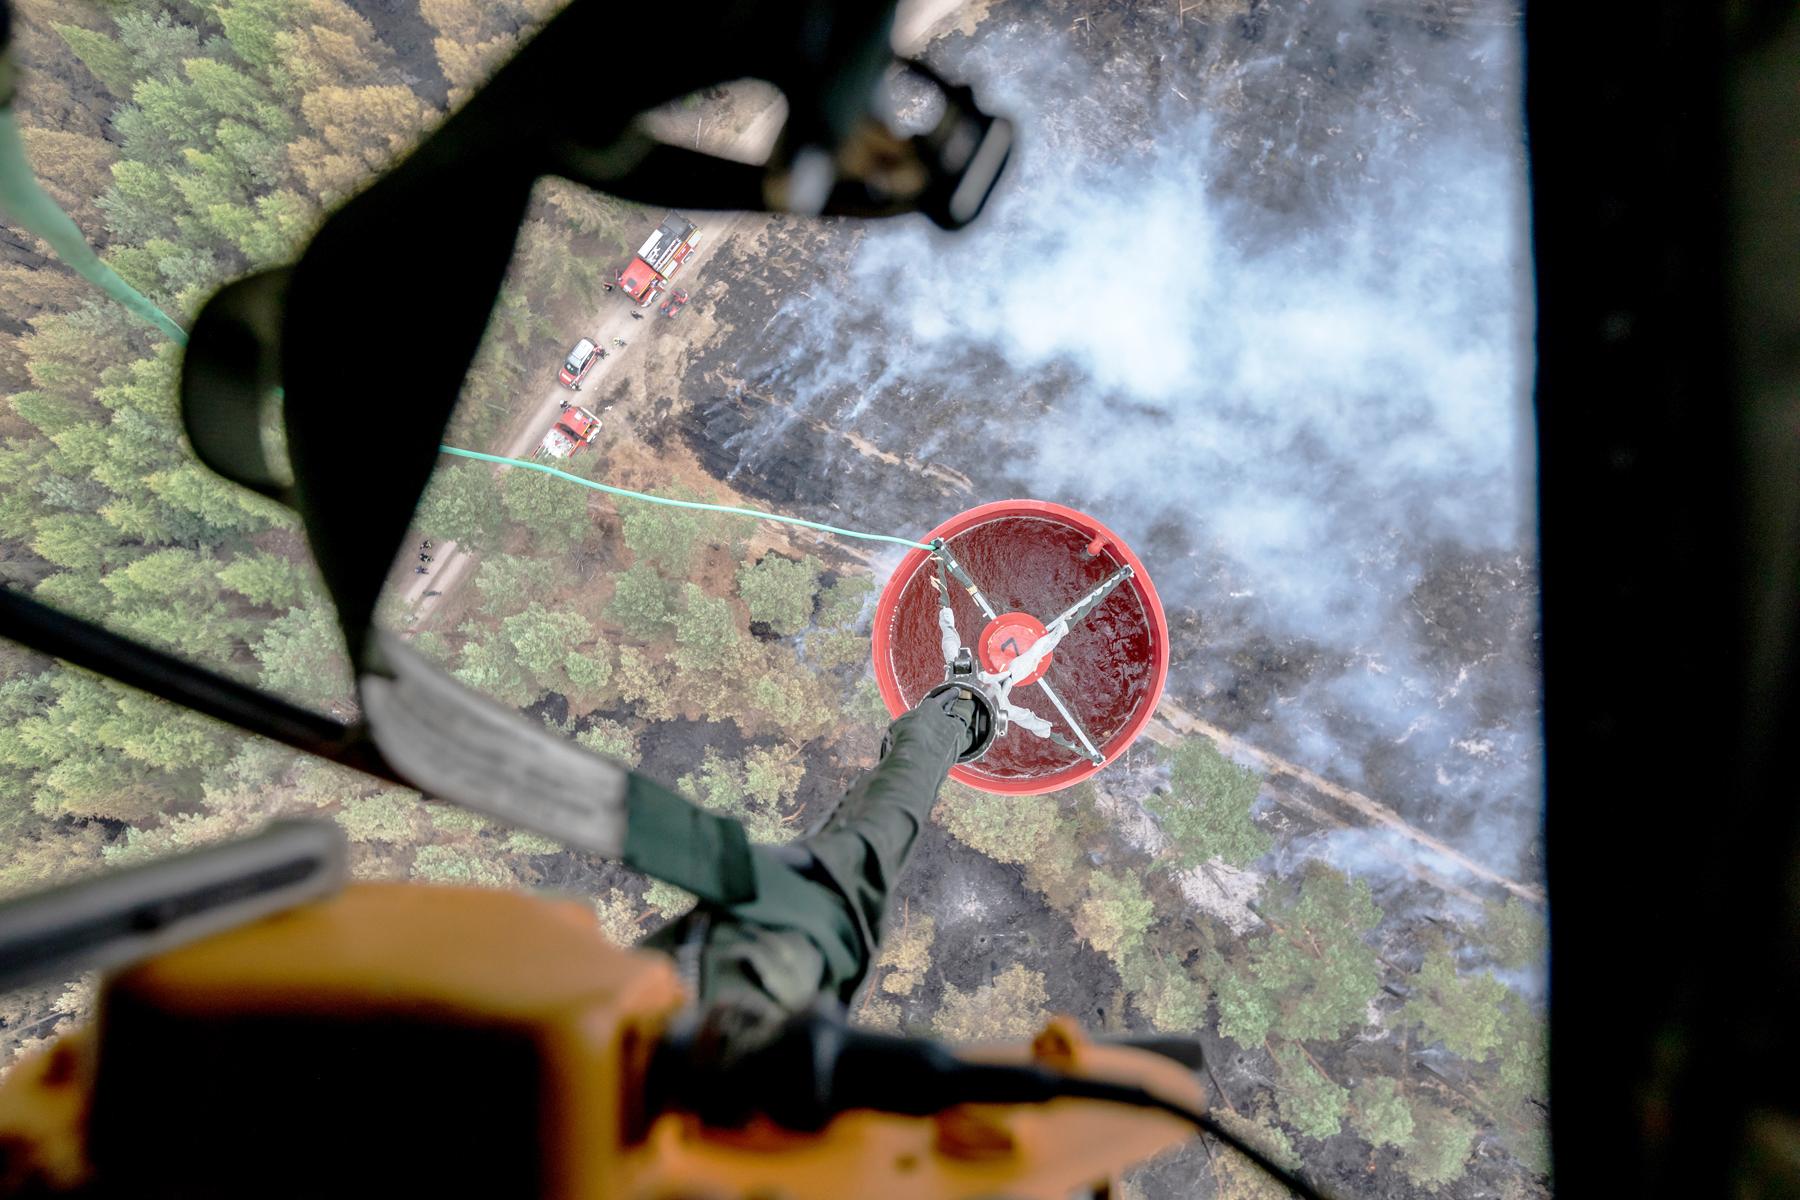 www.cockpit.aero